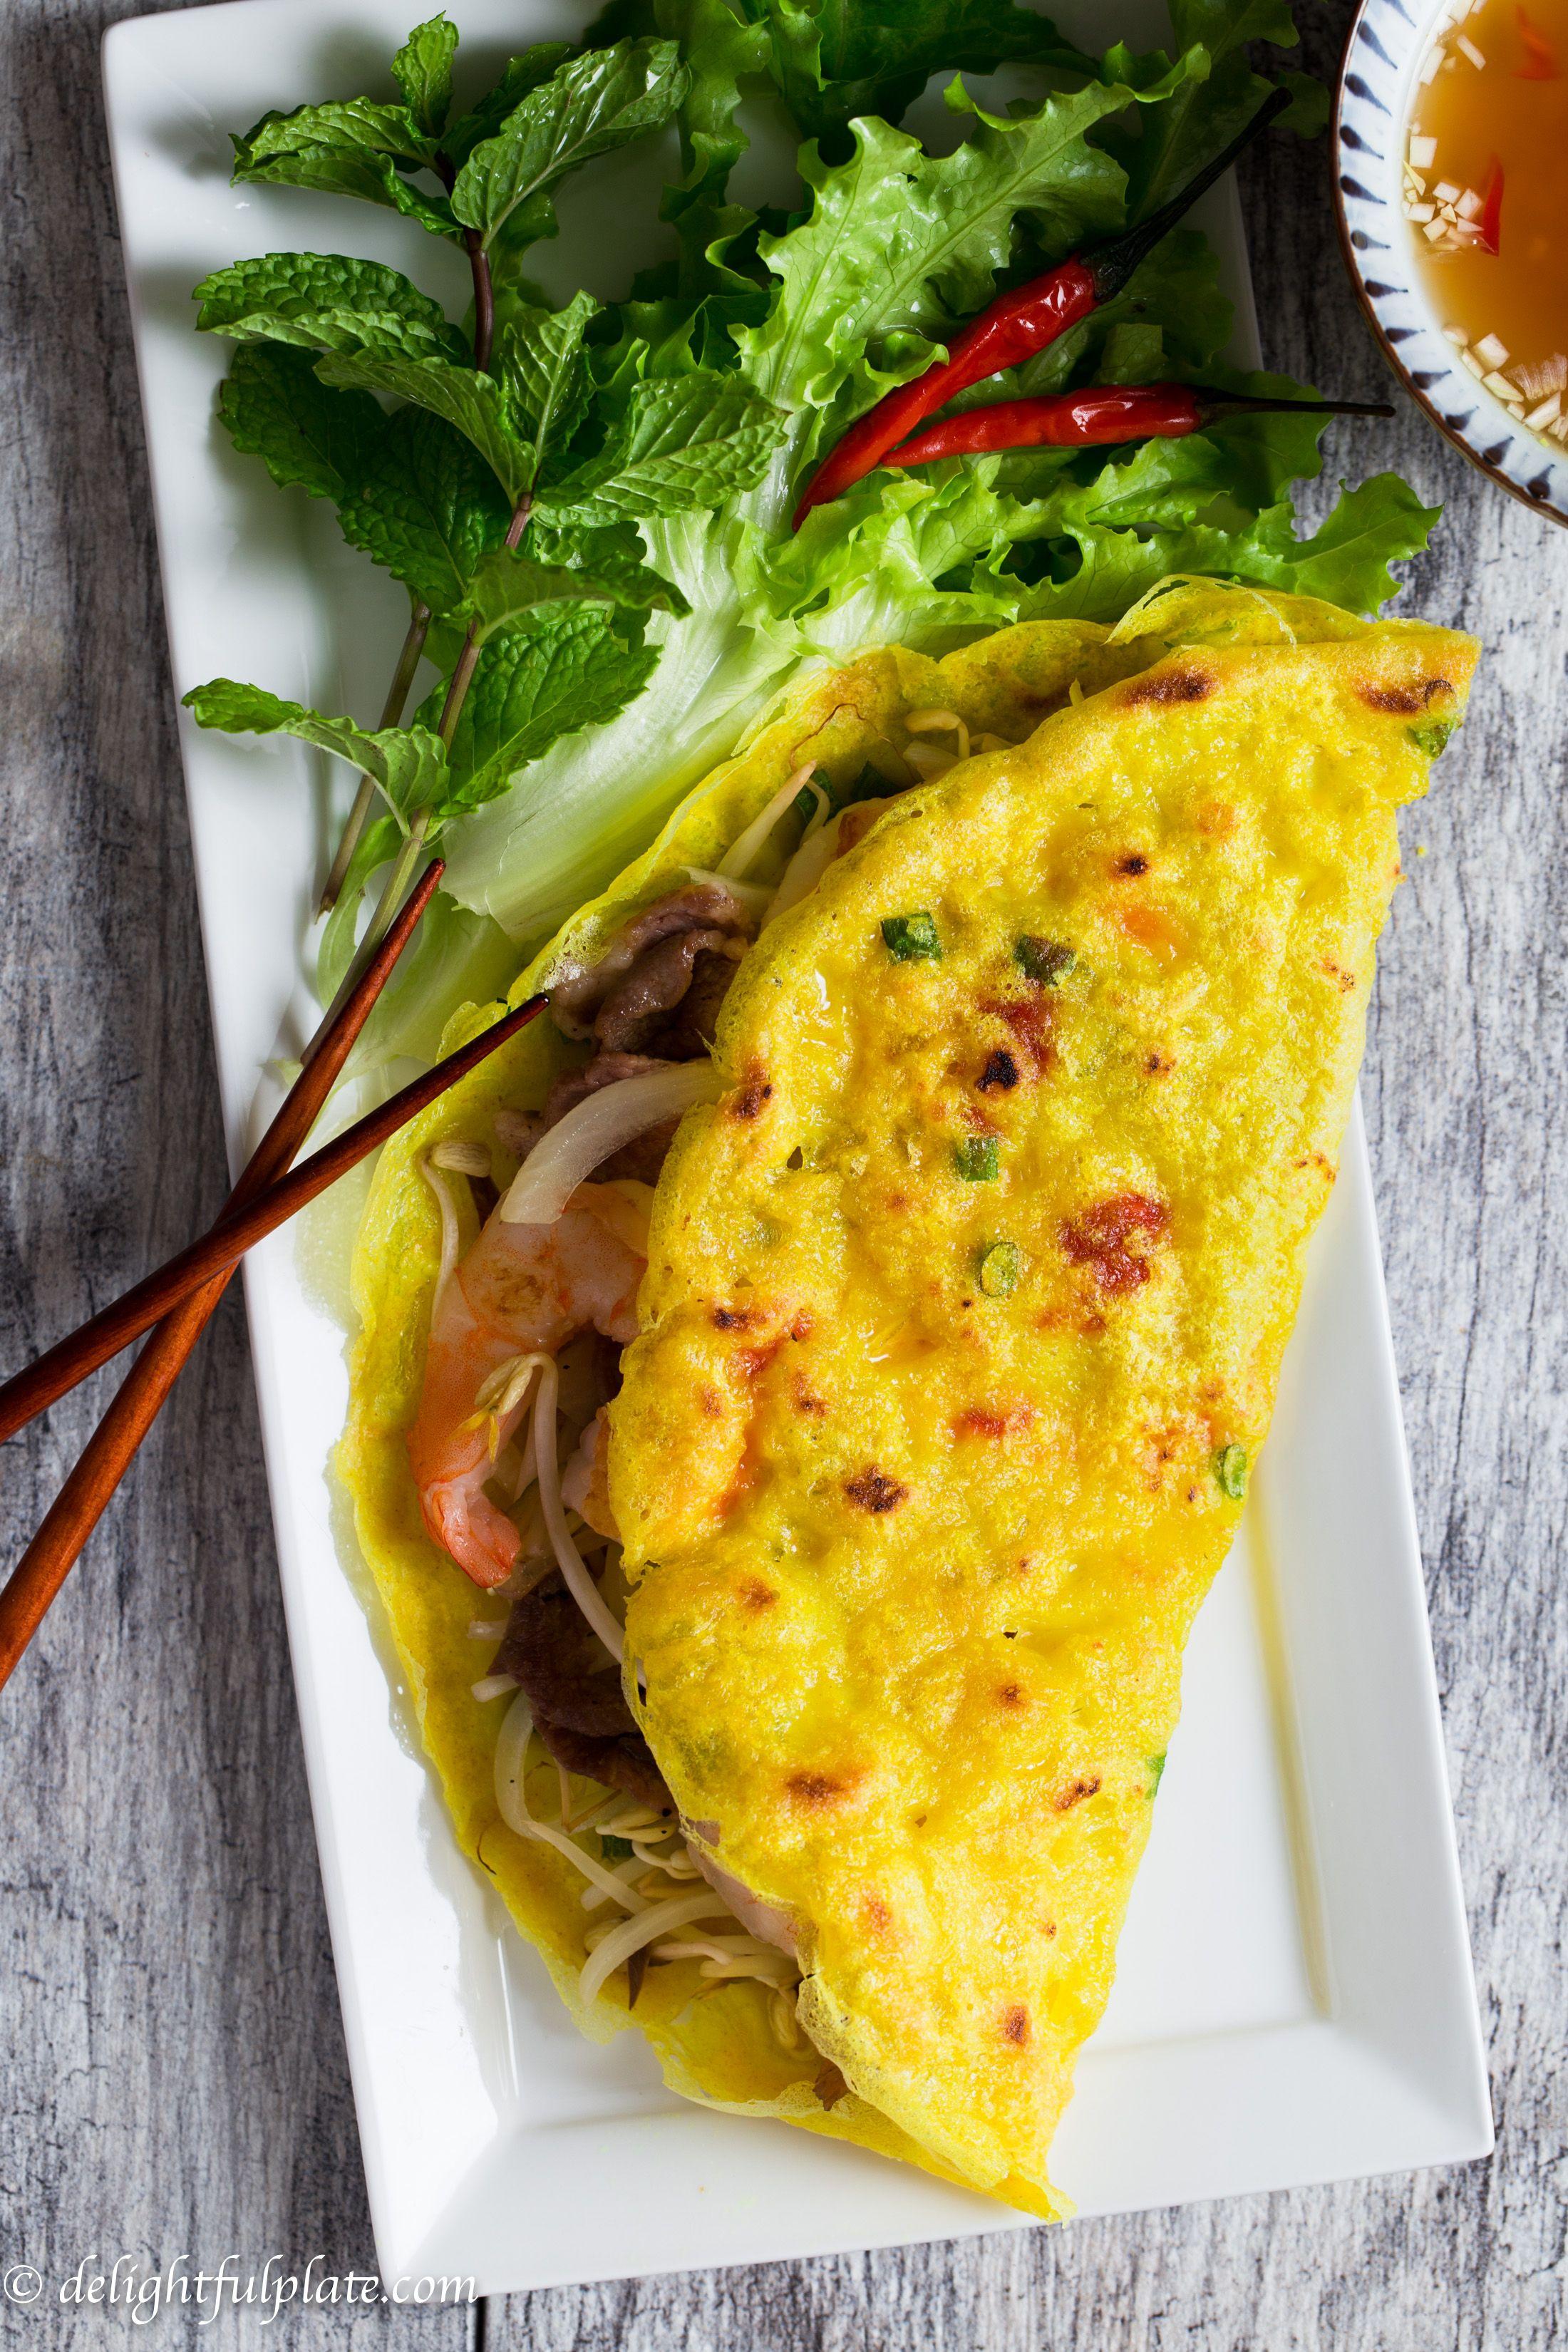 Vietnamese Crepe Banh Xeo Delightful Plate Recipe Vietnamese Crepes Banh Xeo Recipes